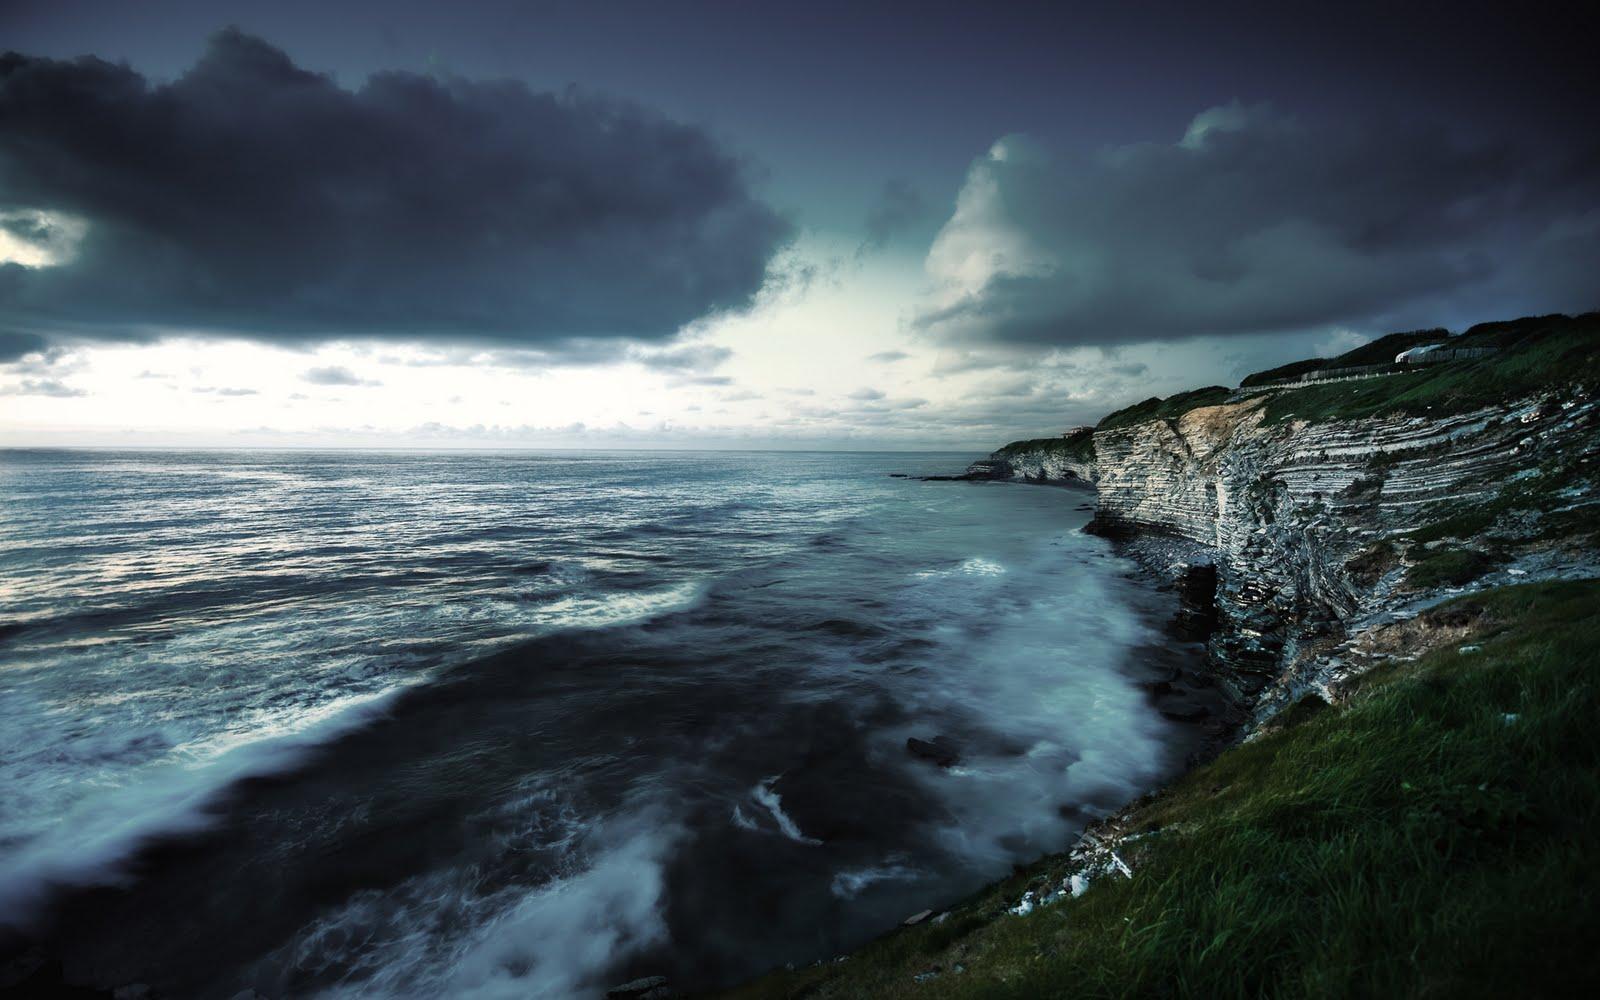 http://4.bp.blogspot.com/-vze-HseBaw4/TcYu4YSe8BI/AAAAAAAAKx4/GjGbQ1YBBkM/s1600/atlantic-east-coast.jpg